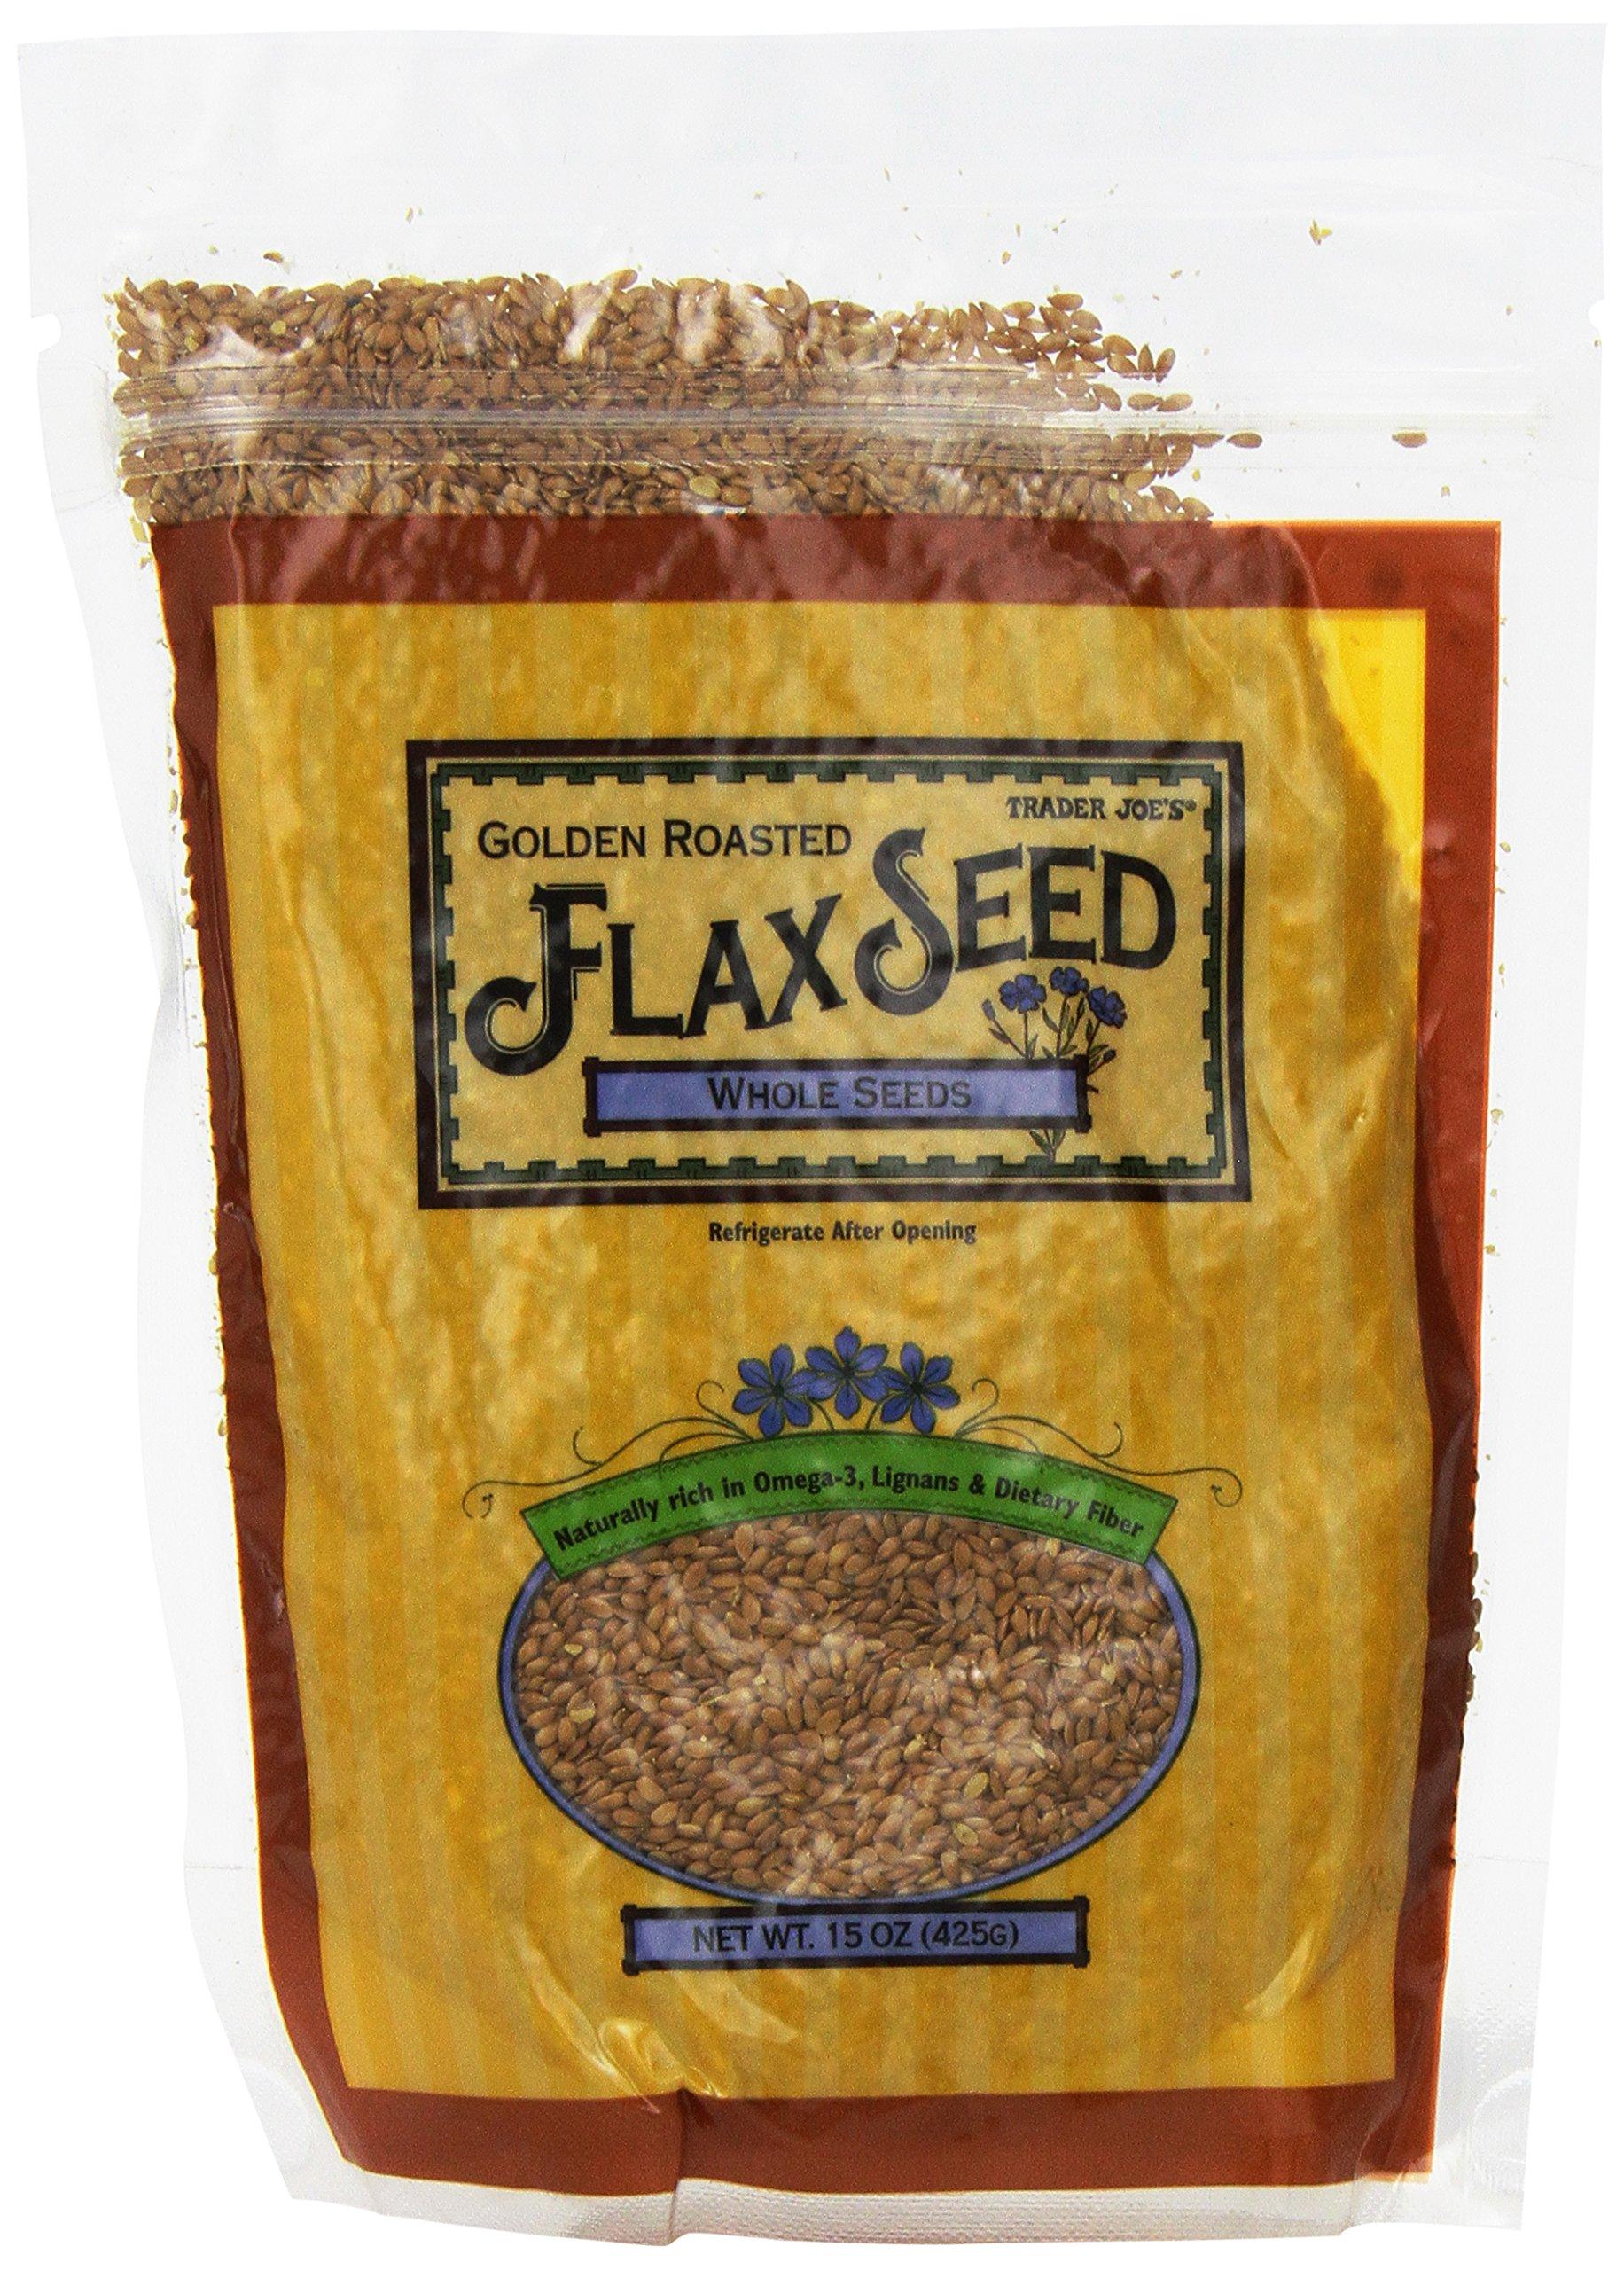 Trader Joe's Golden Roasted Flax Seeds Whole Seeds 15 oz(425g)